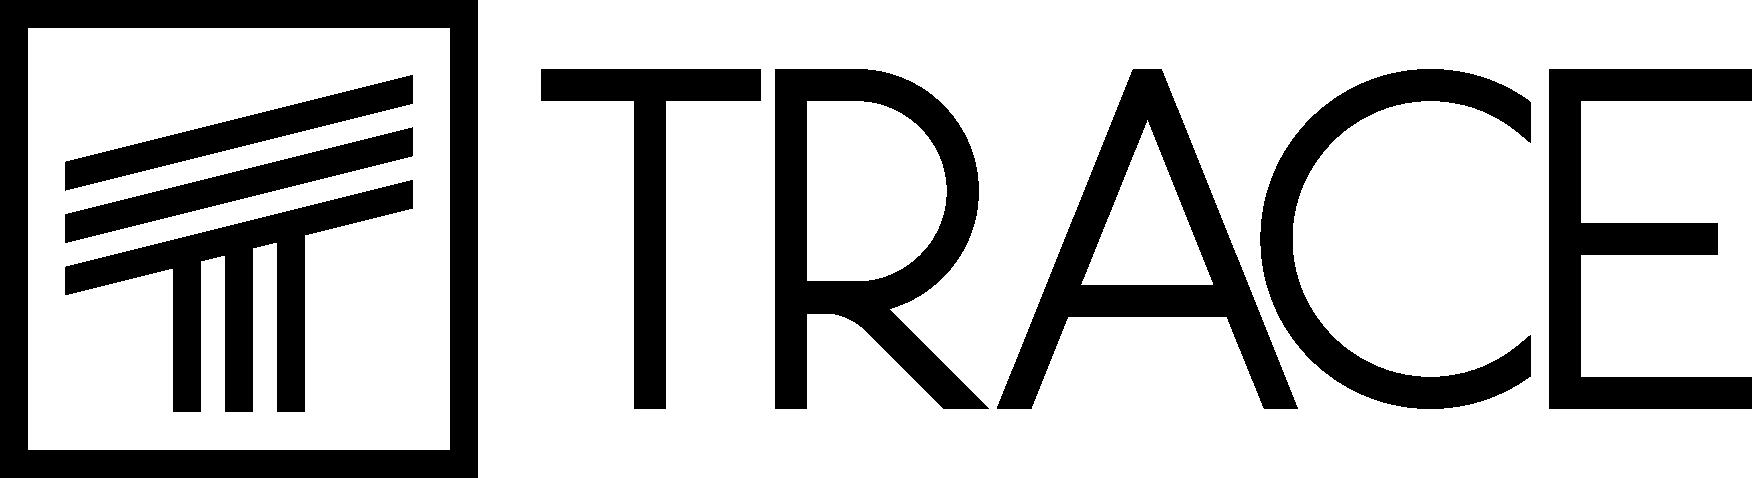 Trace Custom Homes Black 2.png